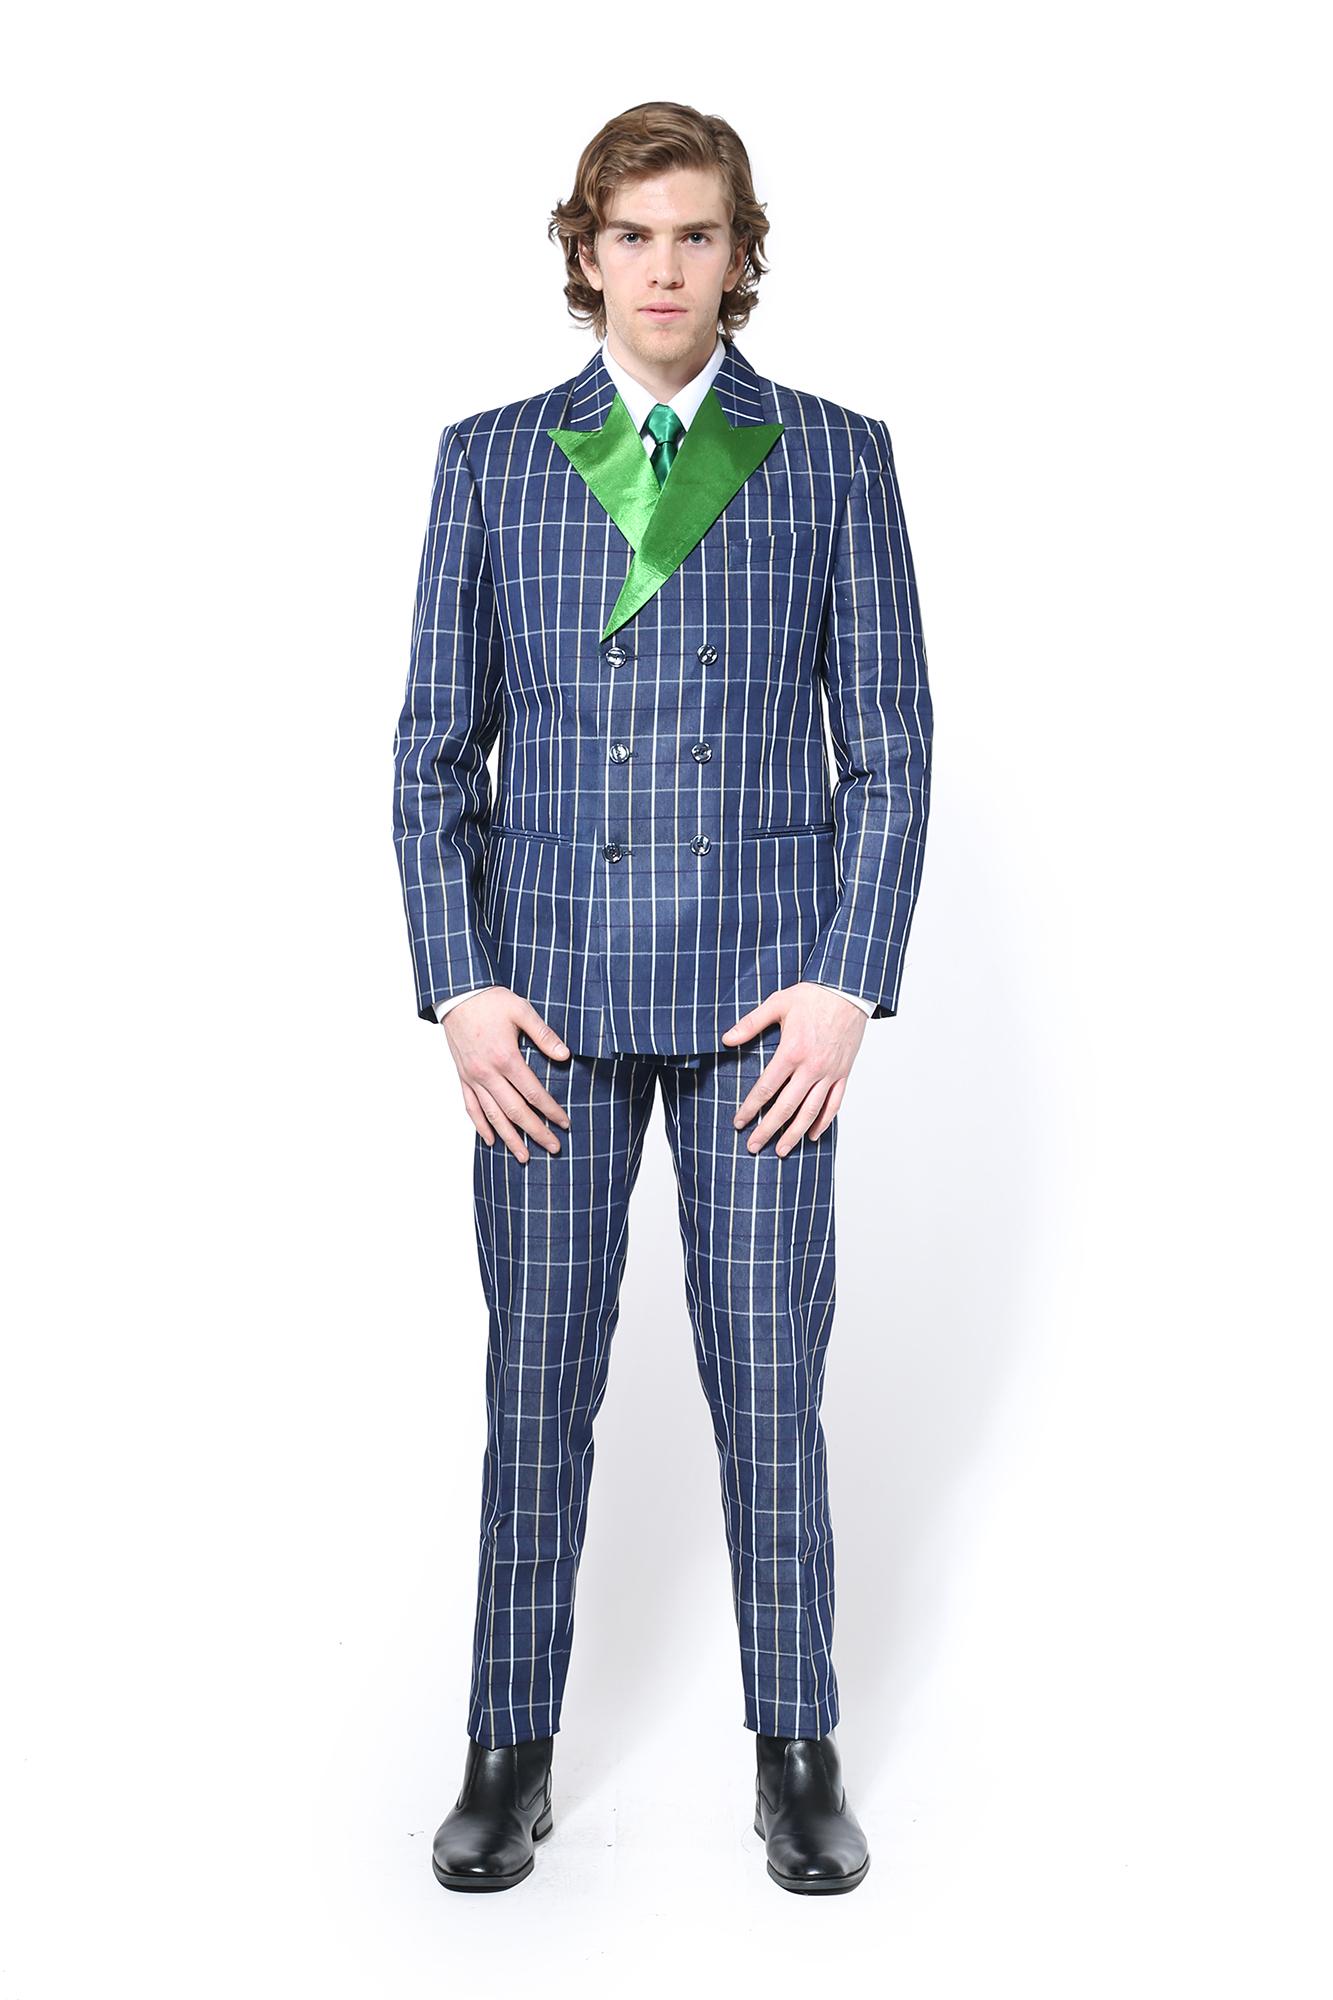 1700d0f1 Home / Clavon Leonard / Season / FW17 M / Navy Blue Pinstripe Suit with  Green Satin Lapel